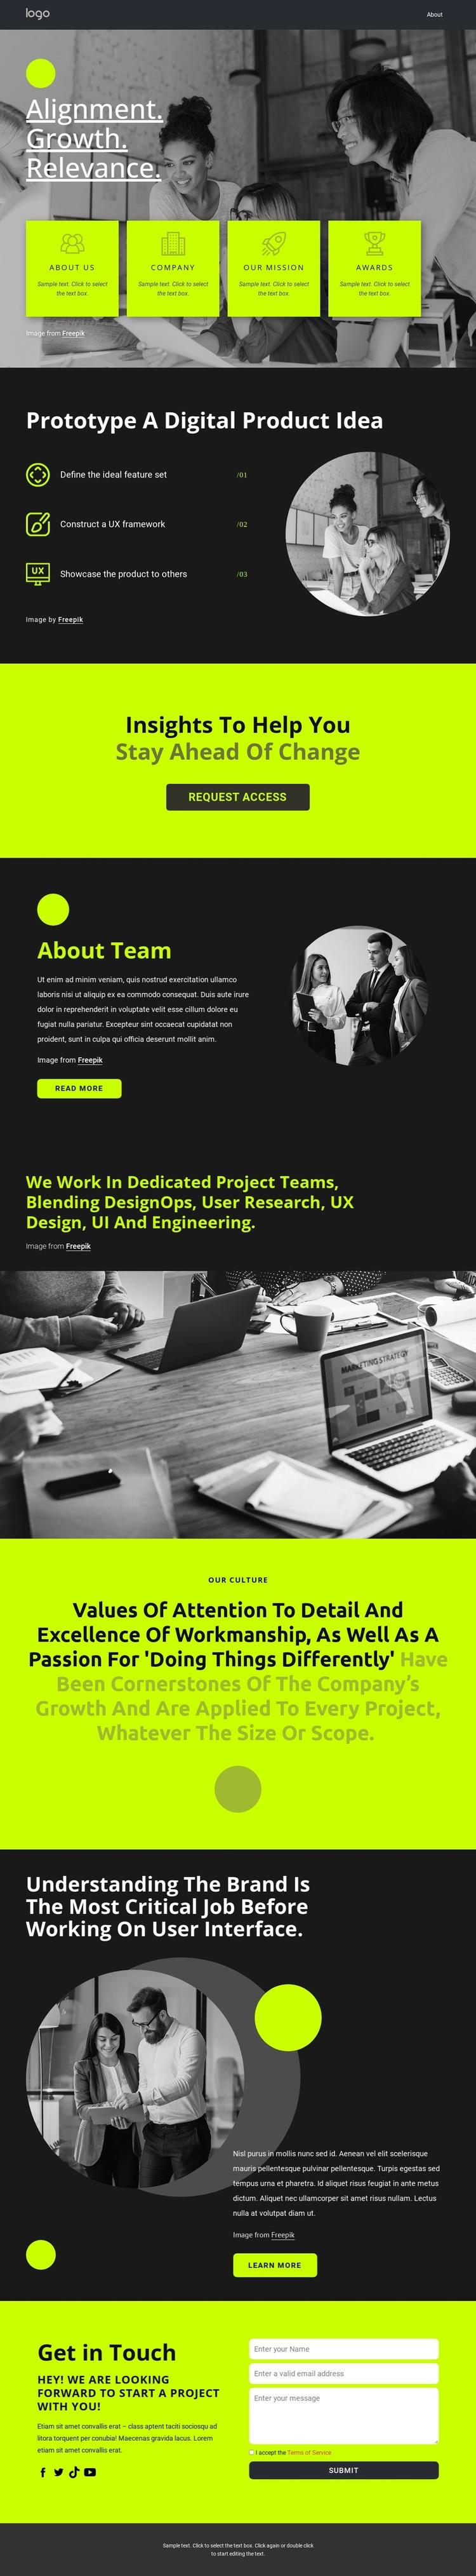 Build great digital products Website Builder Software